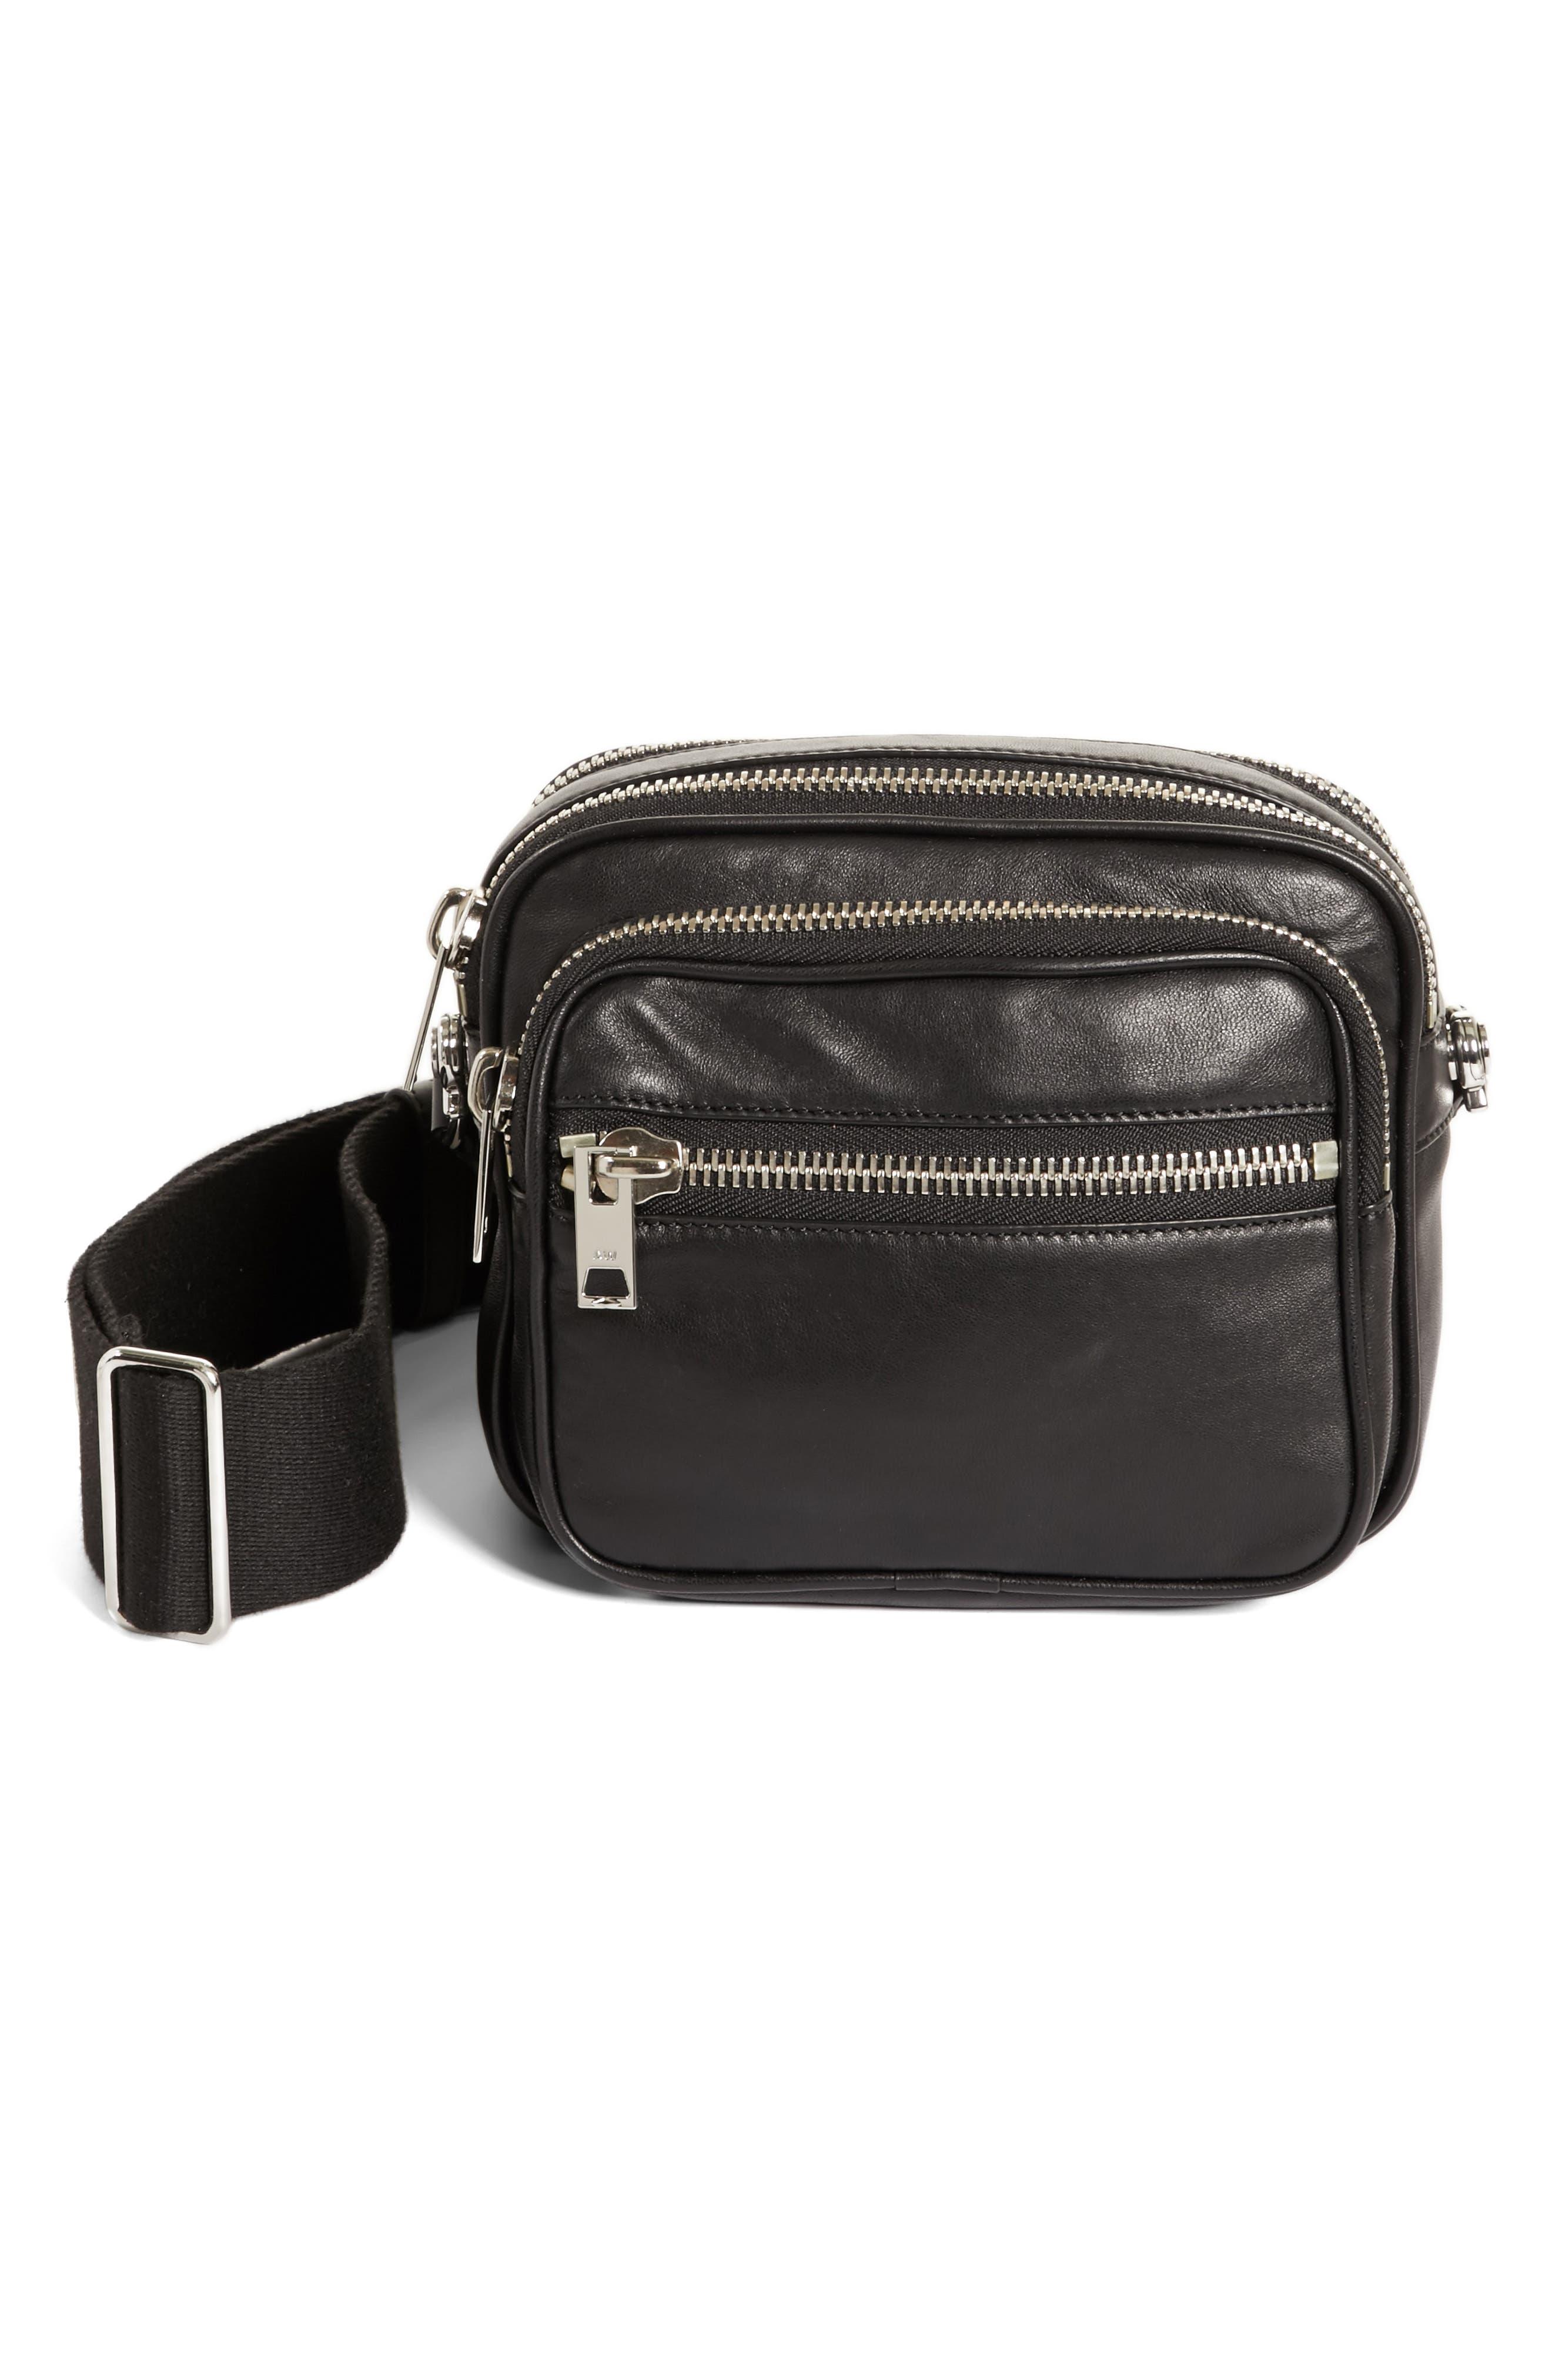 Main Image - Alexander Wang Large Attica Leather Crossbody Bag